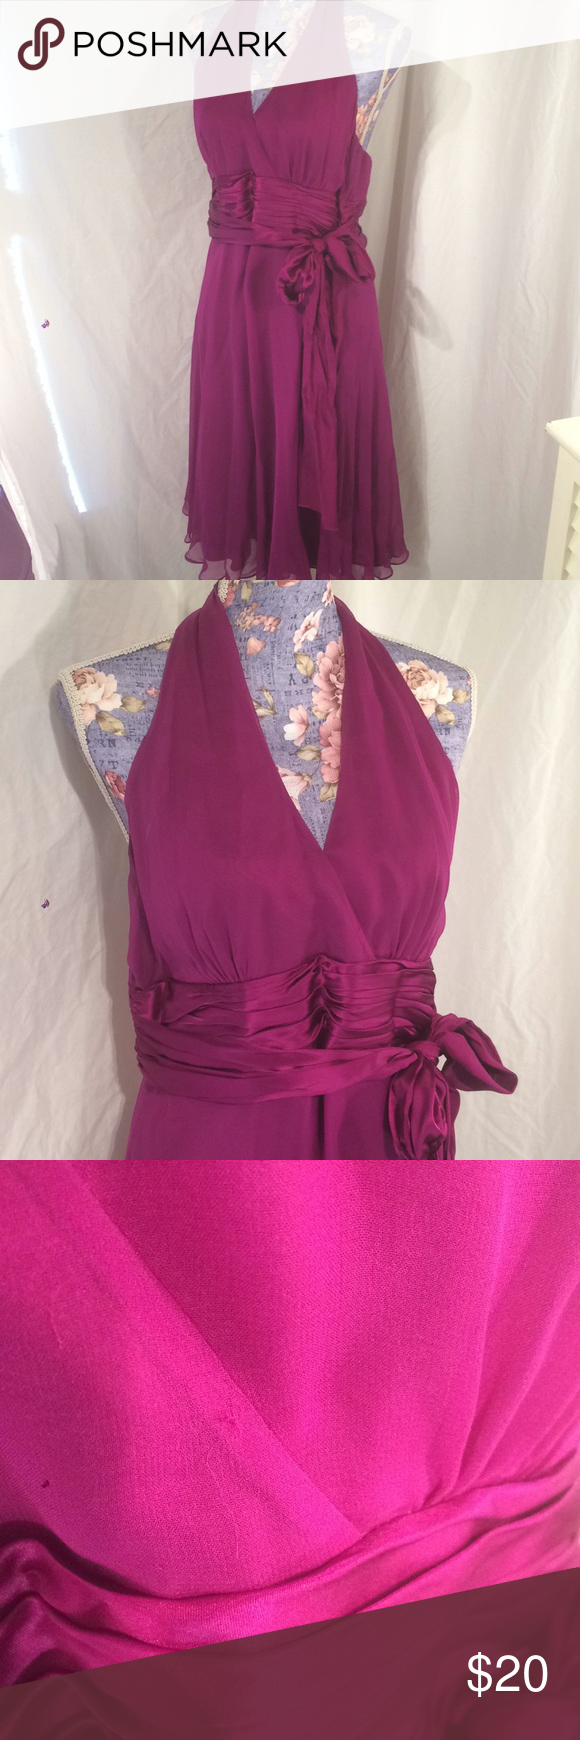 Lujo Maggy London Cocktail Dresses Composición - Colección de ...